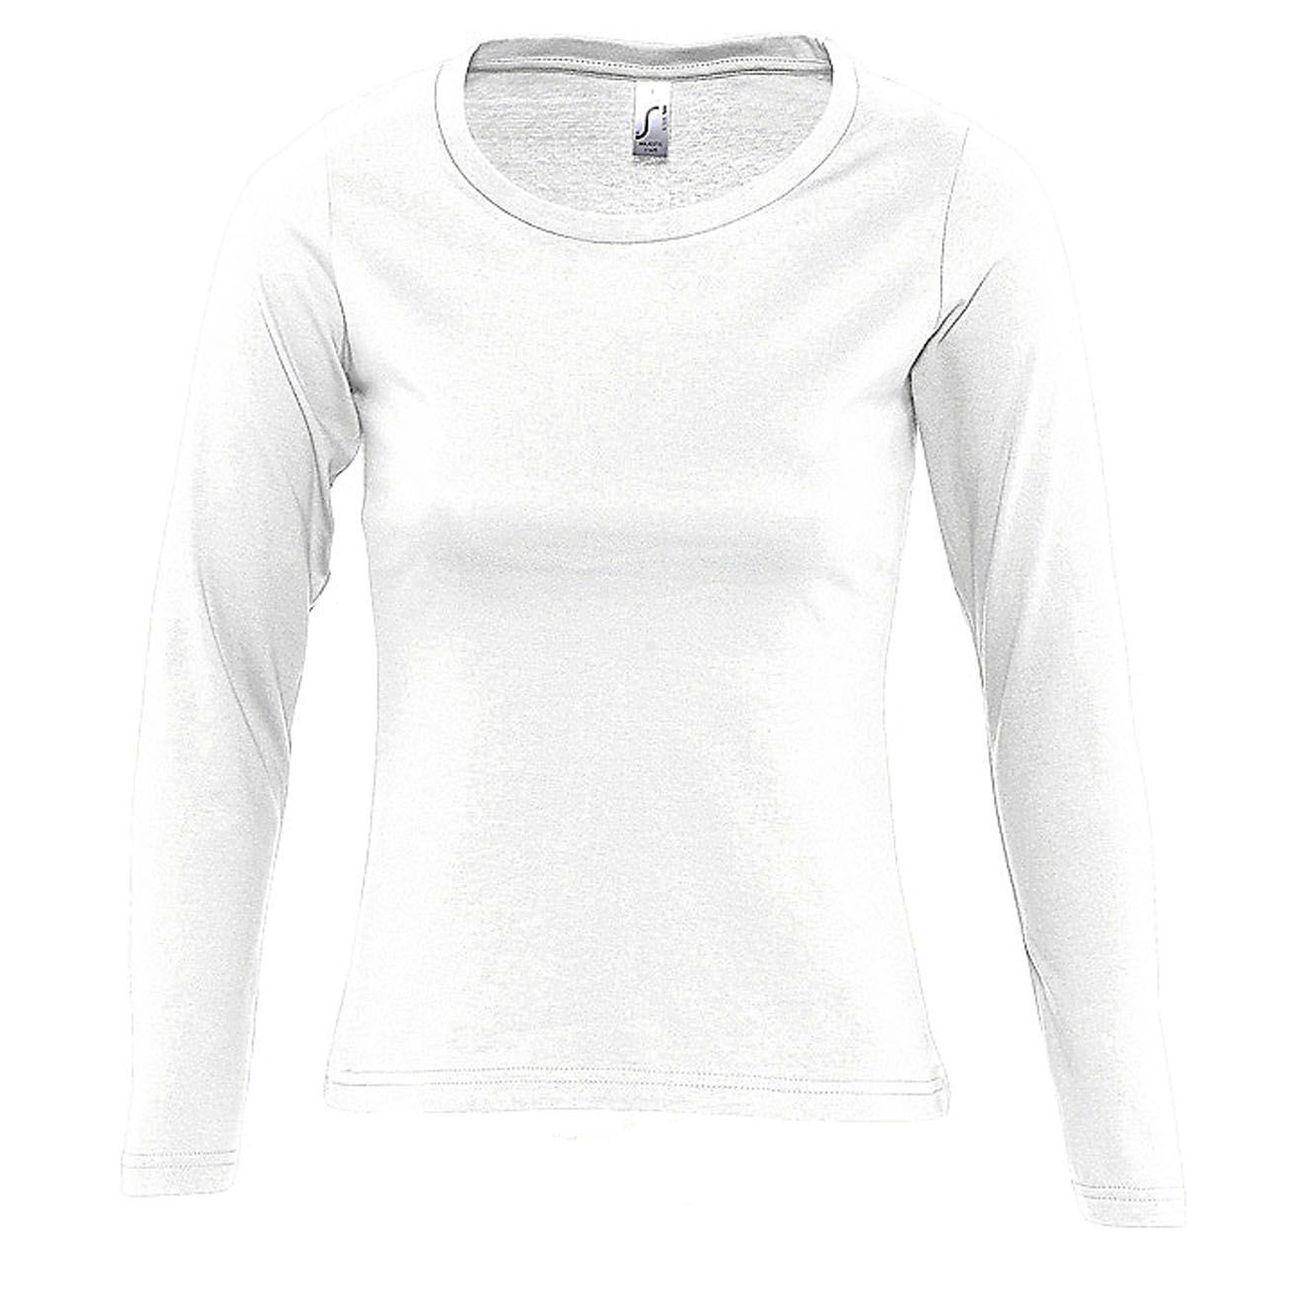 Mode- Lifestyle femme SOL S T-shirt manches longues FEMME - 11425 - blanc